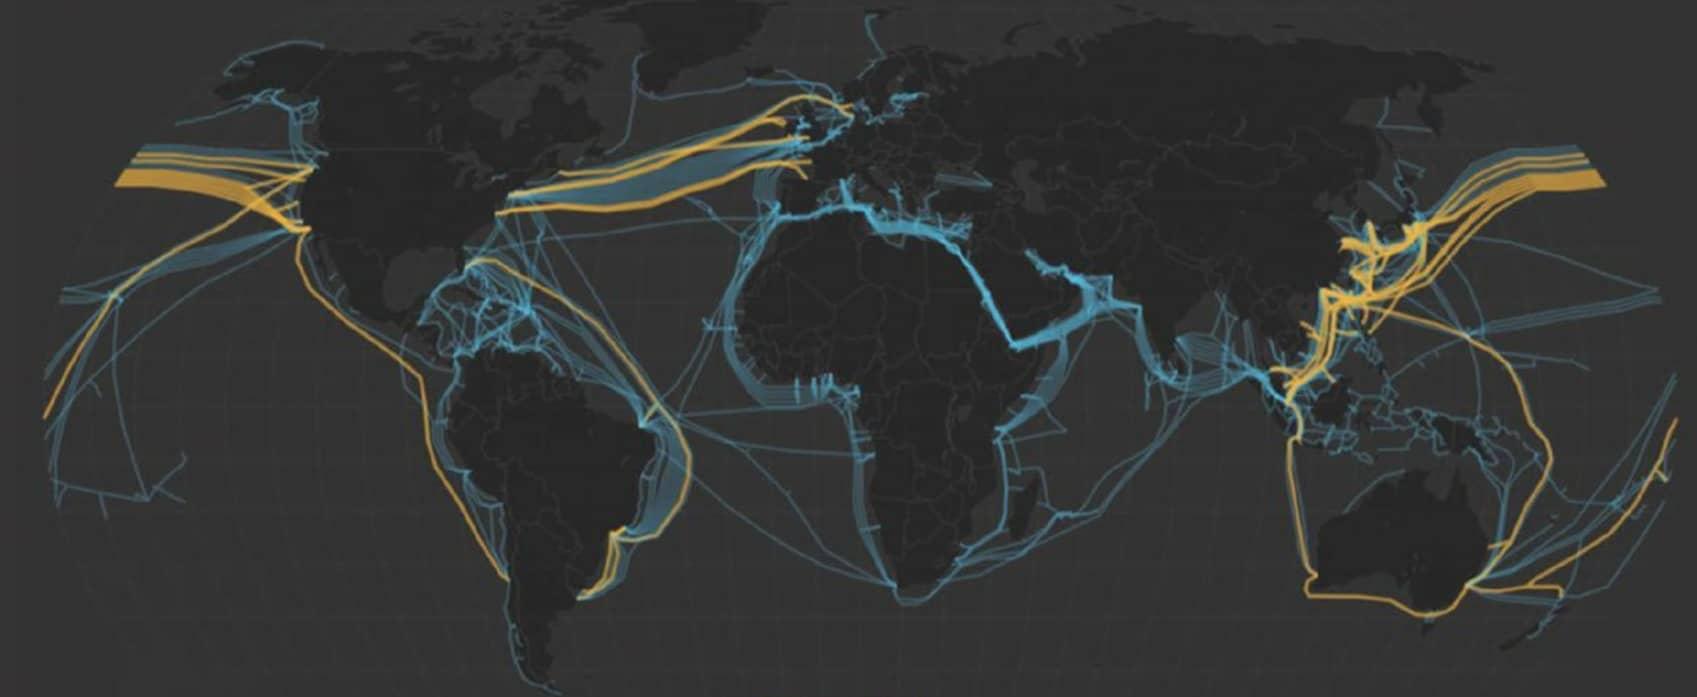 Internet Ocean